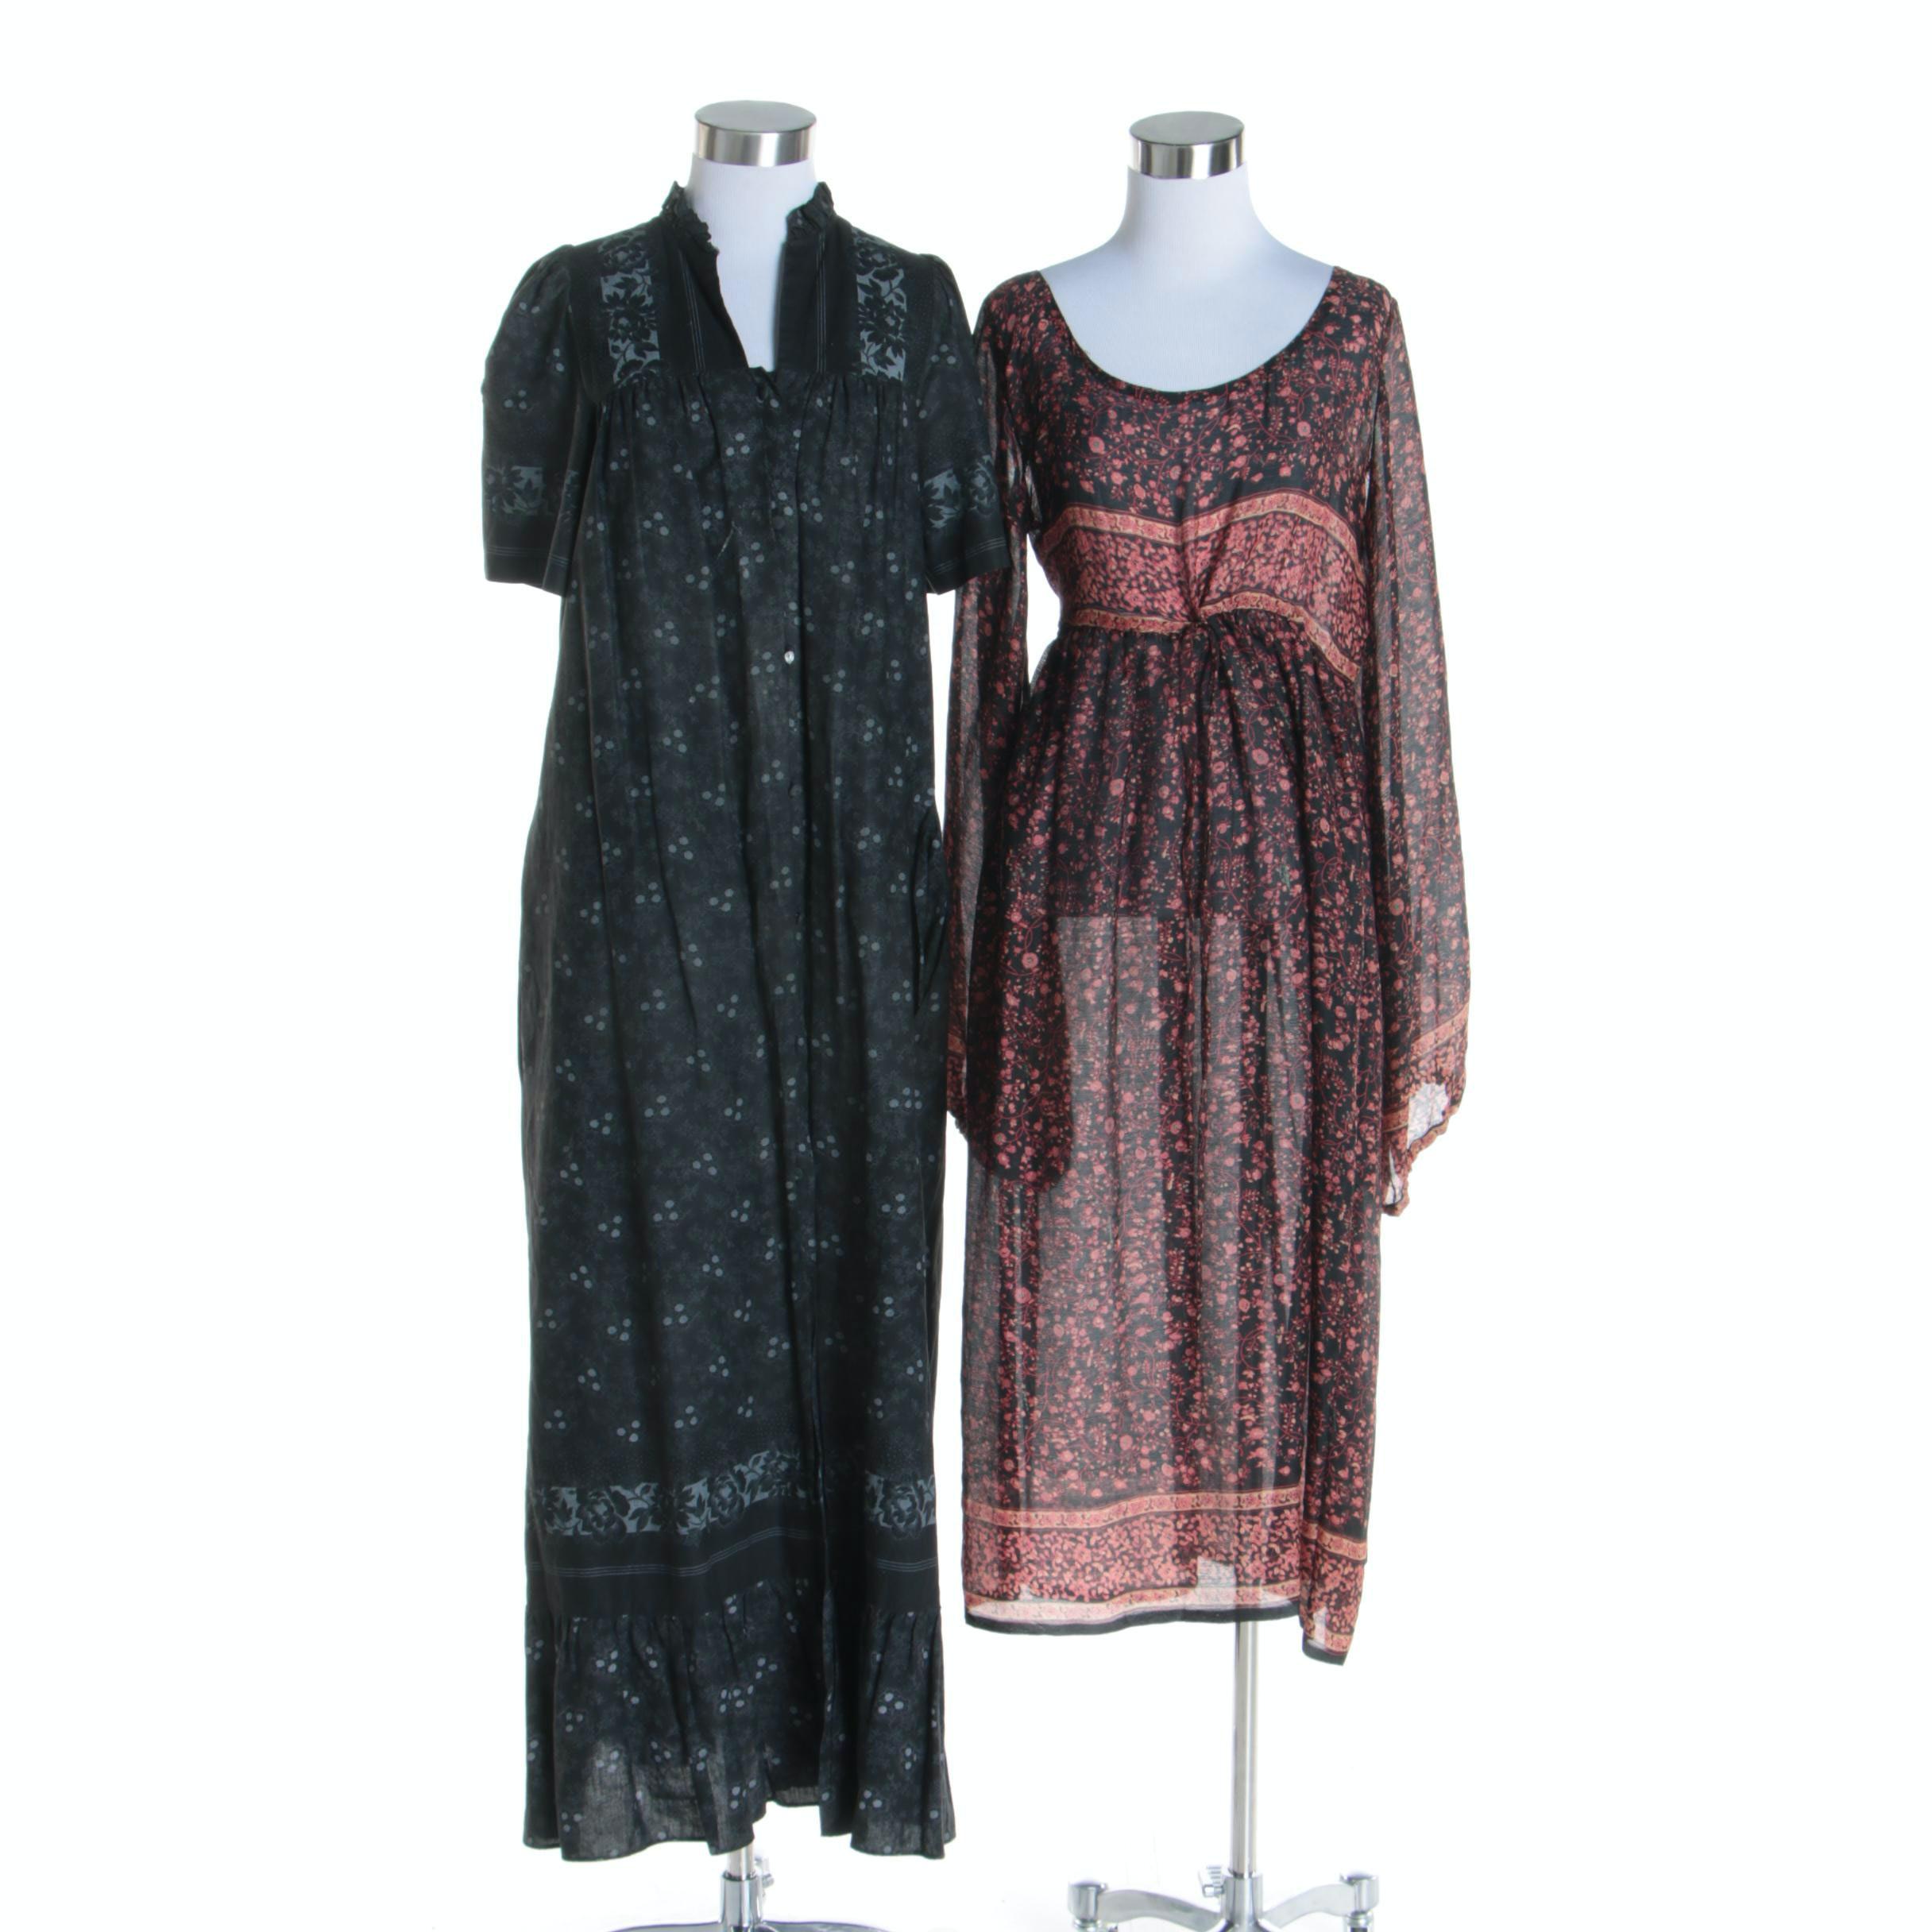 Women's Casual Dresses Including a Silk Dress by Judith Ann for Heiser-Egan